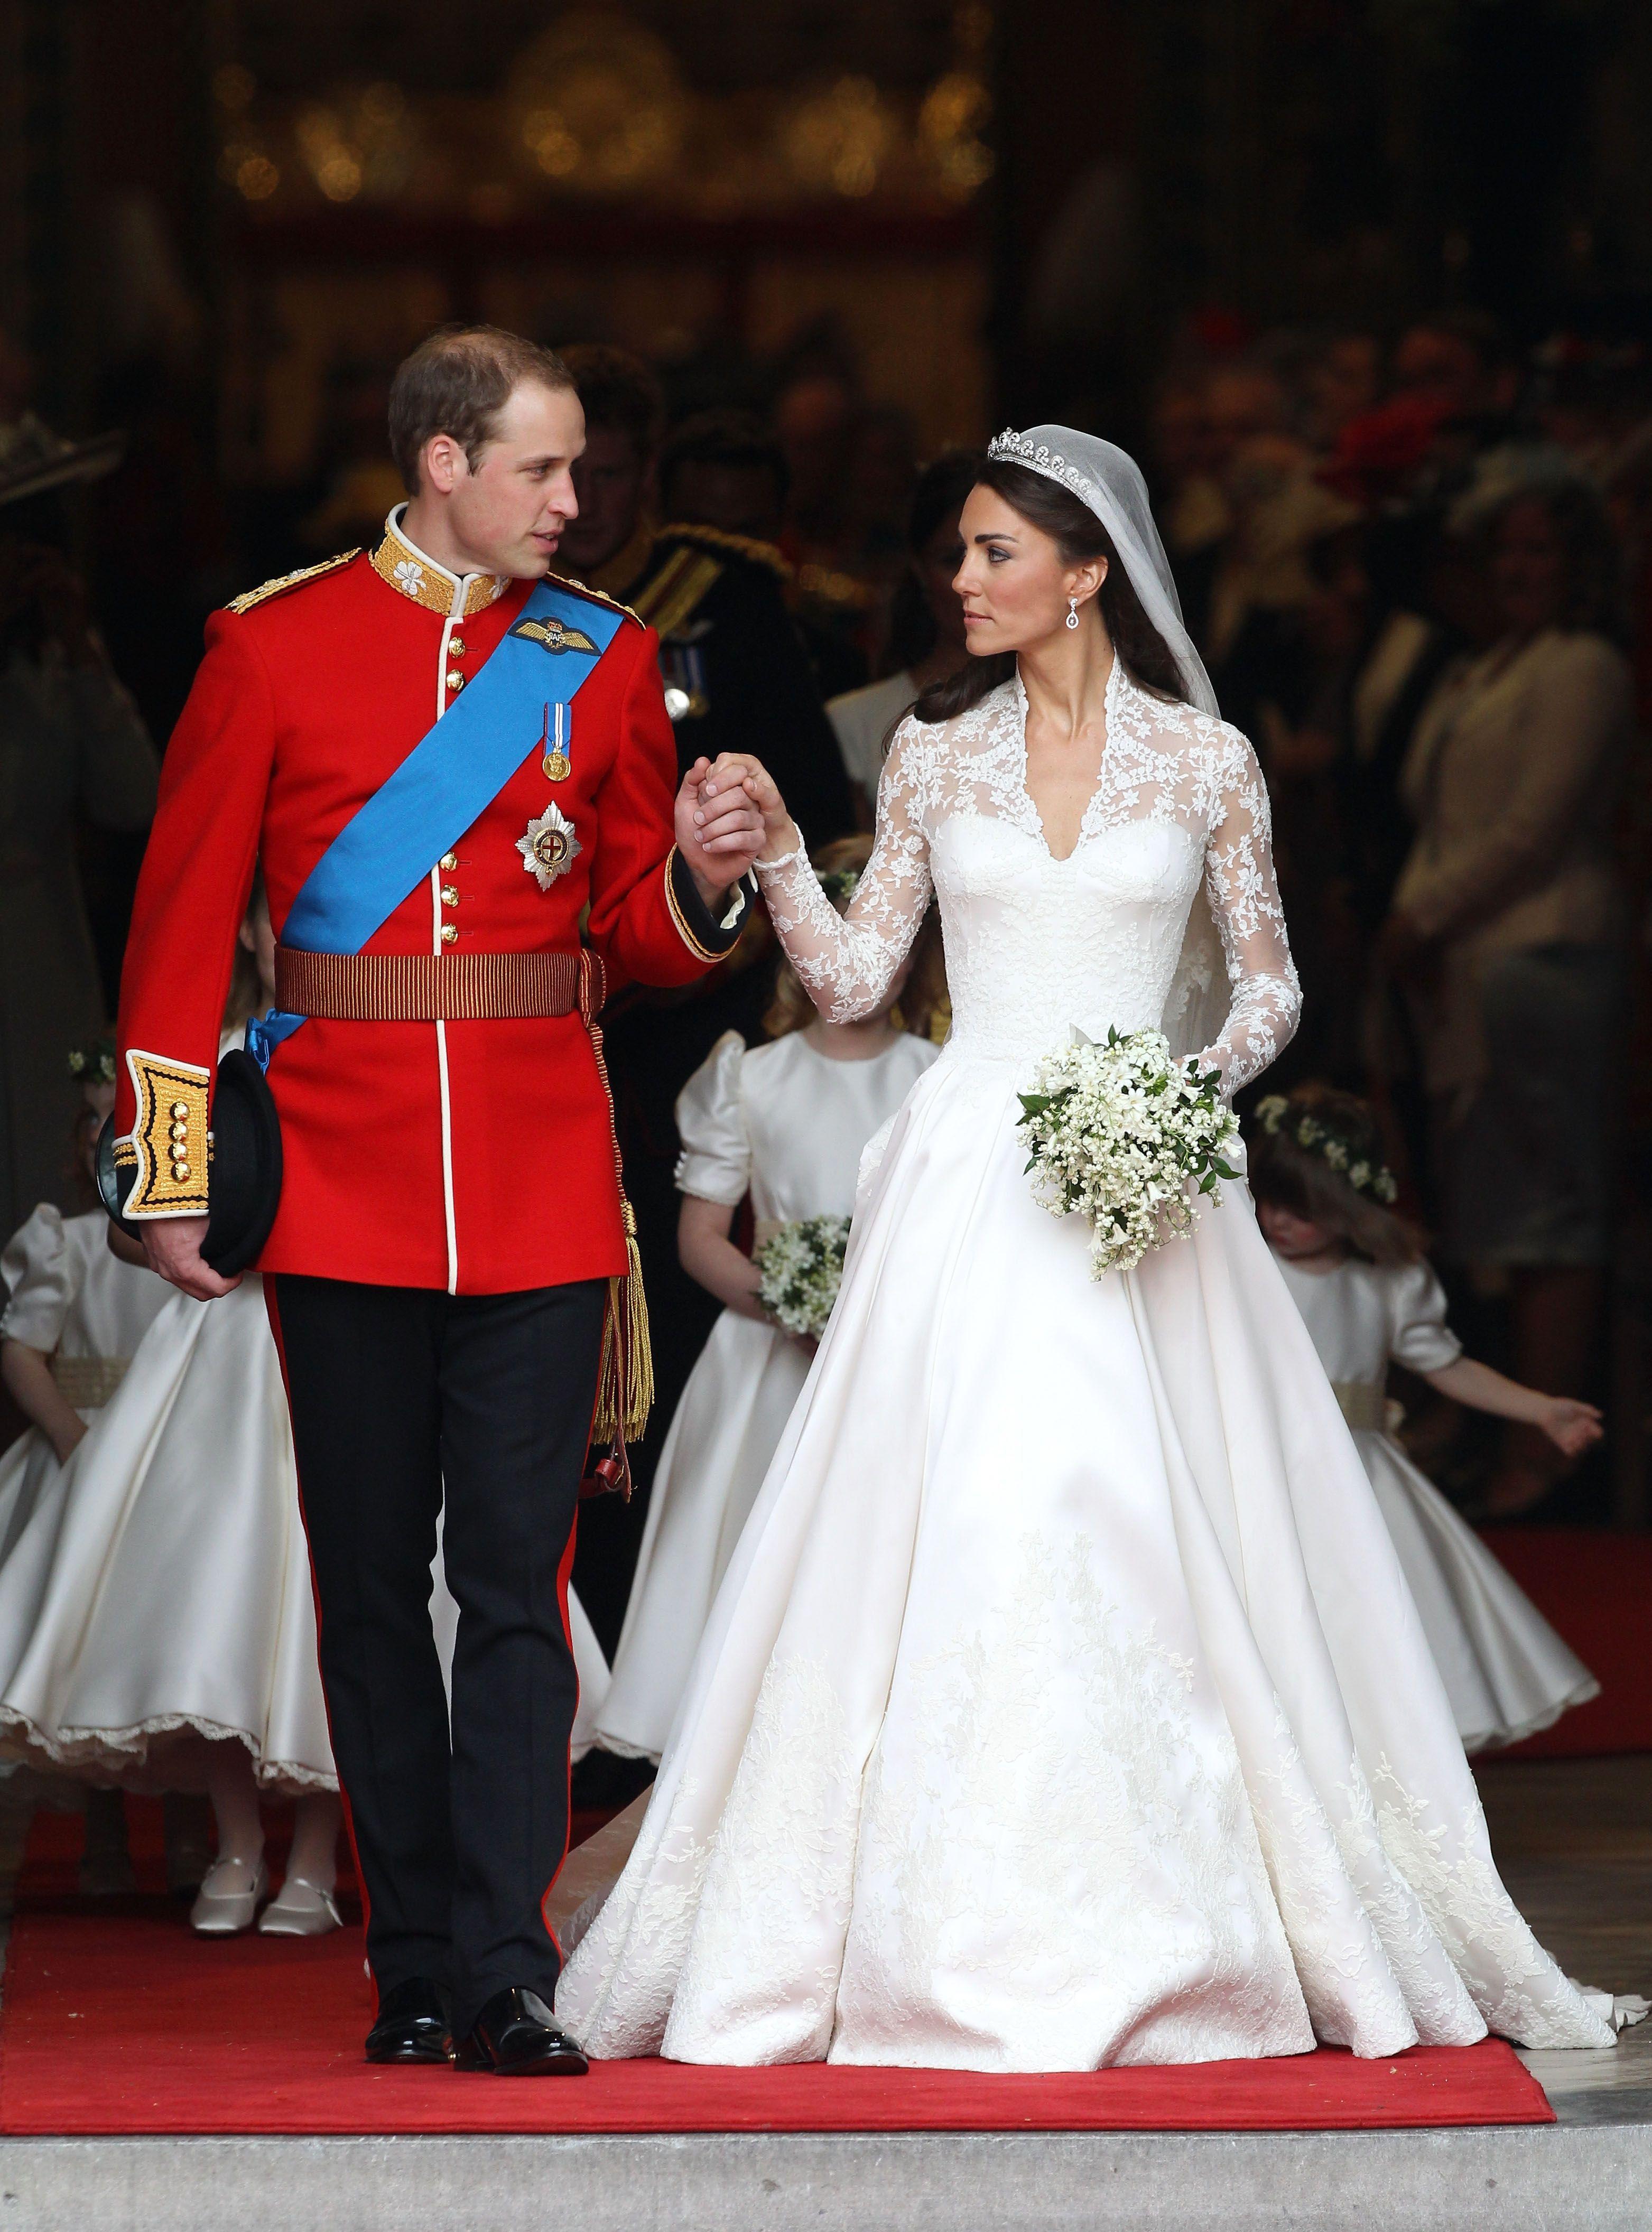 Кейт Мидллтон и герцог Кембриджский Уильям